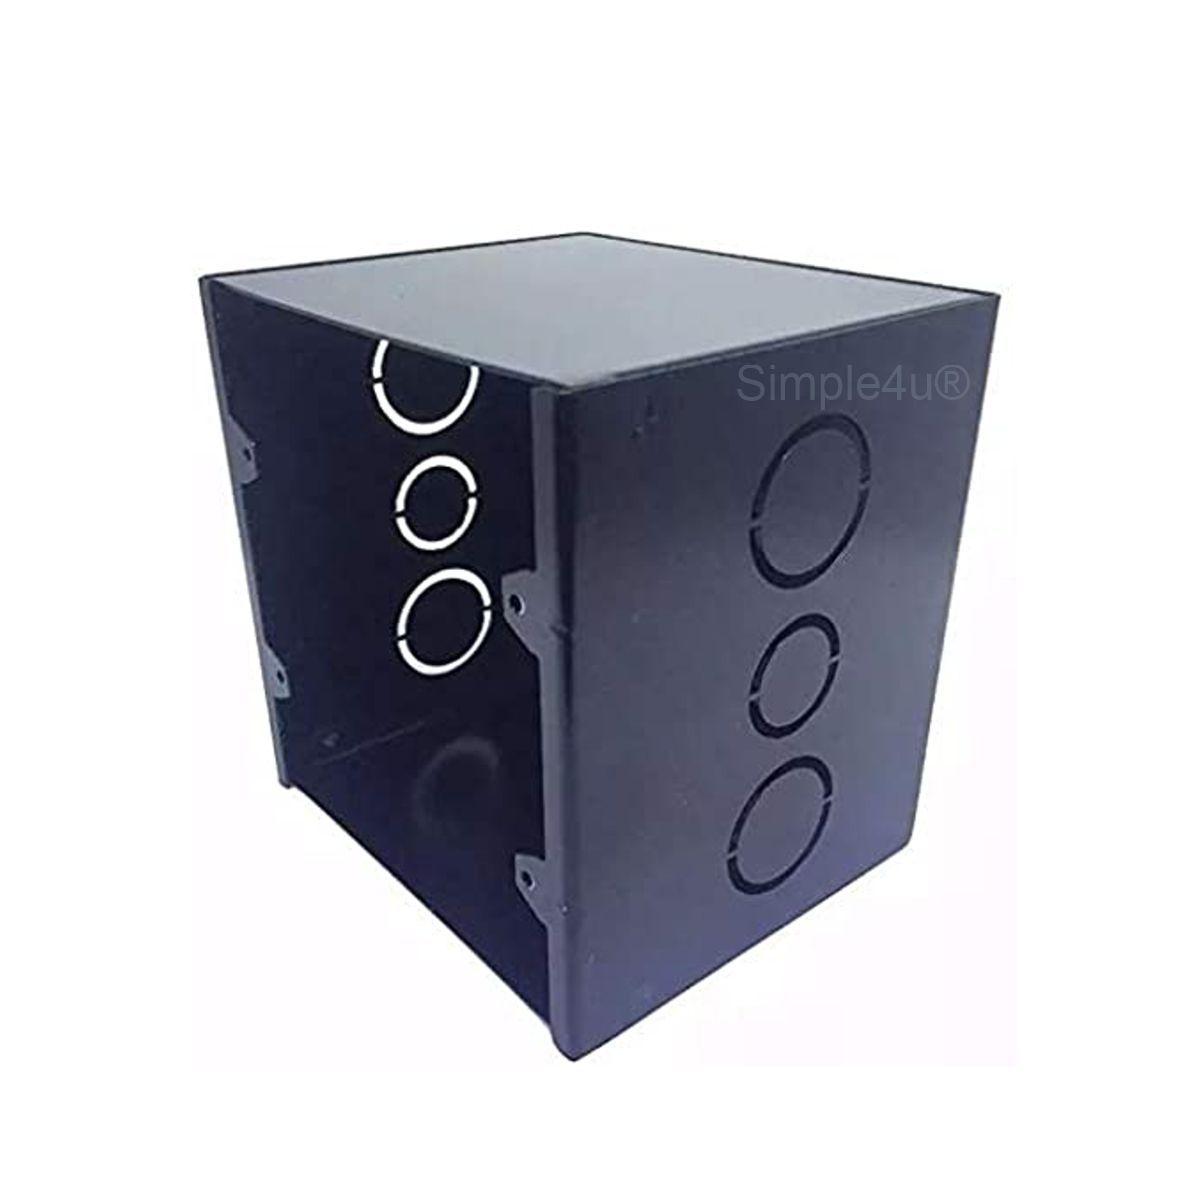 Kit Amplificador de Parede Bluetooth LAC NG + 2 Caixas Acústicas de Embutir LR6-120 BL Loud